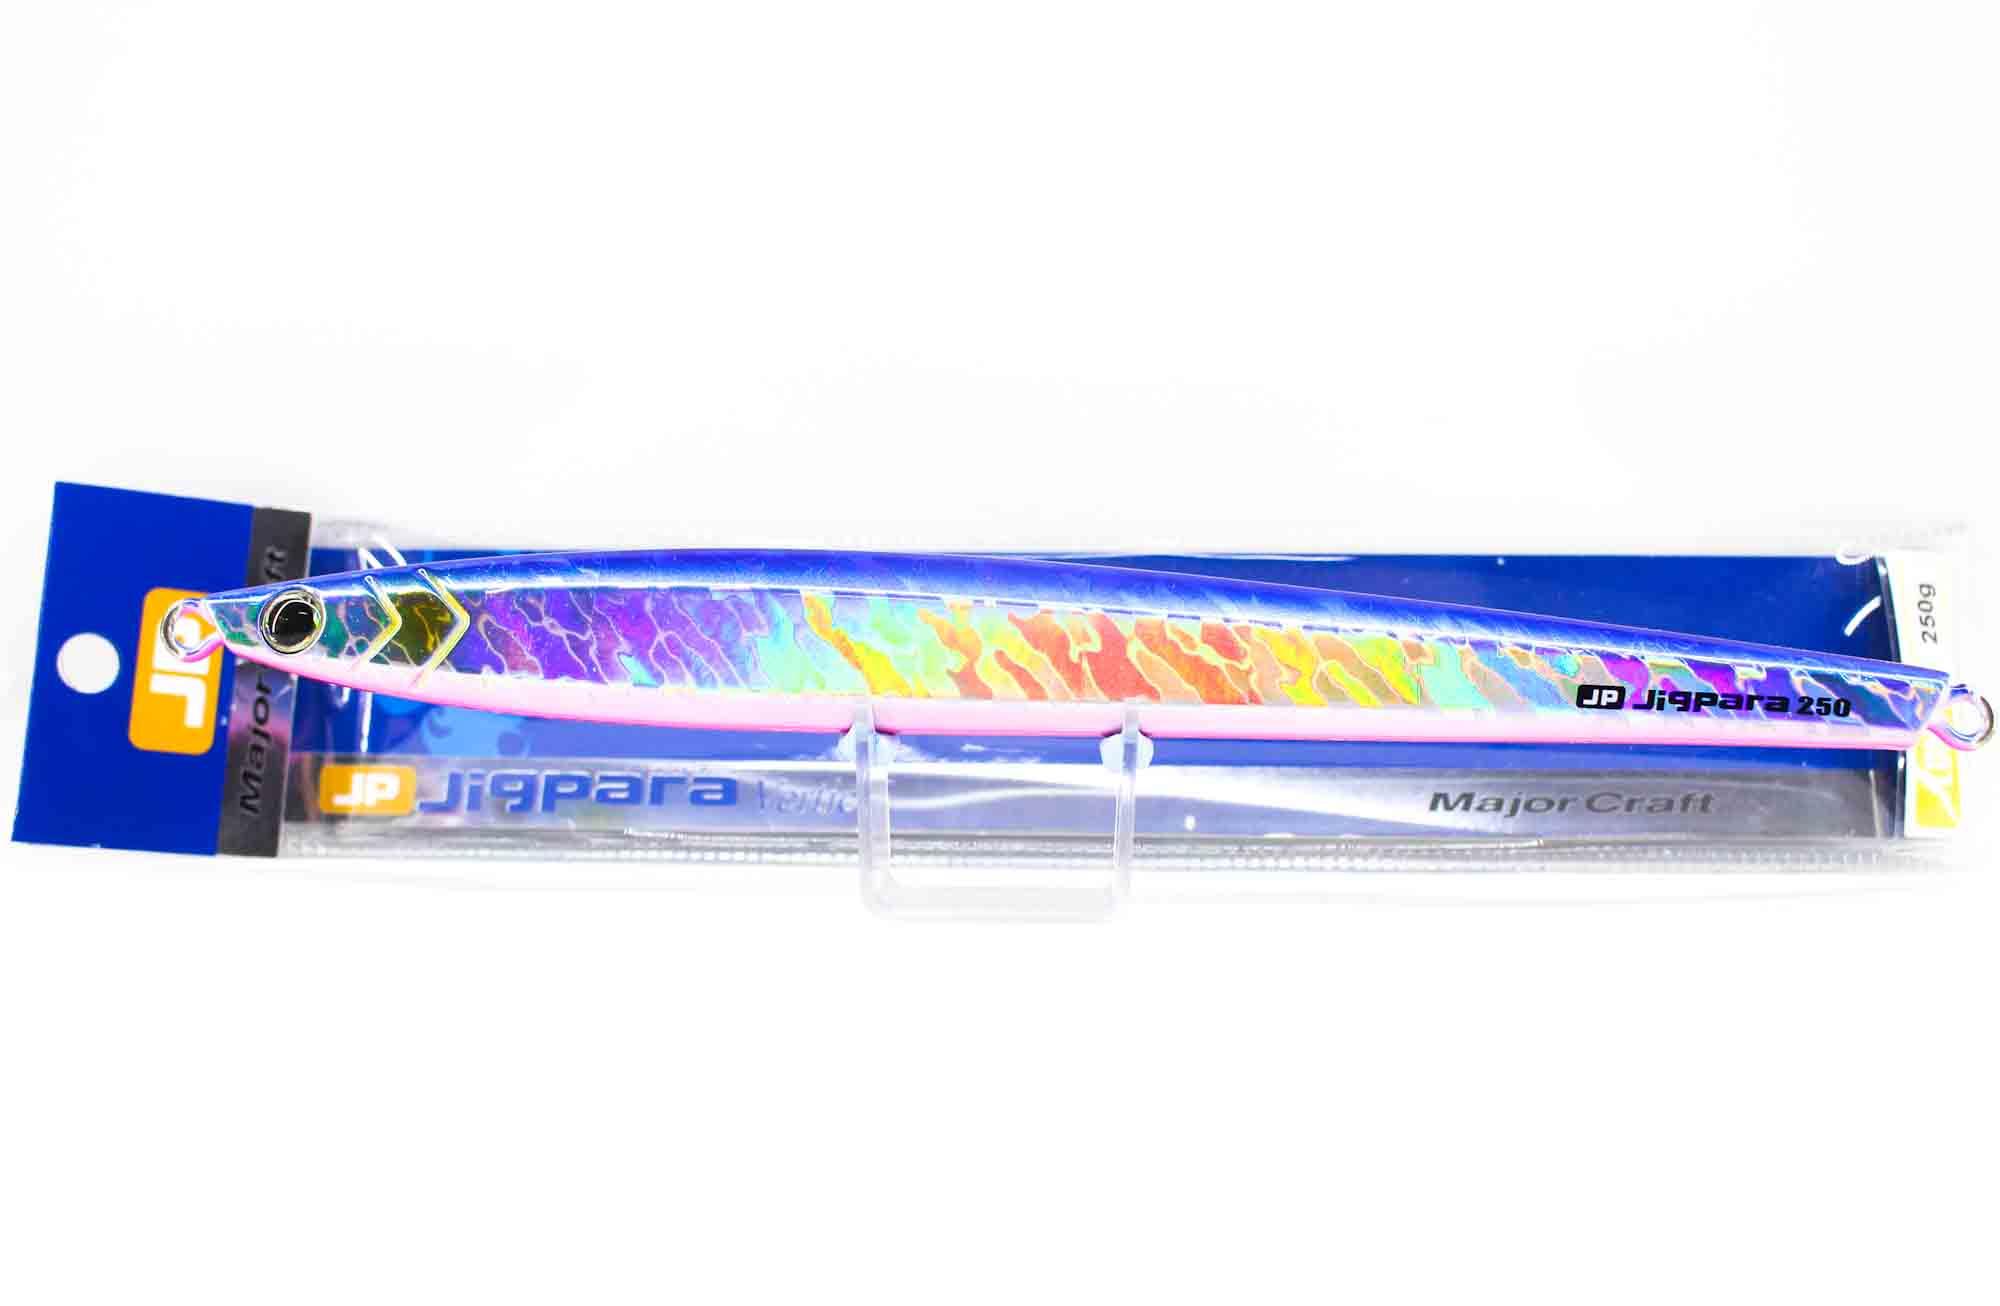 Major Craft Metal Jig Jigpara Vertical JPVL-250 grams 004 (3534)